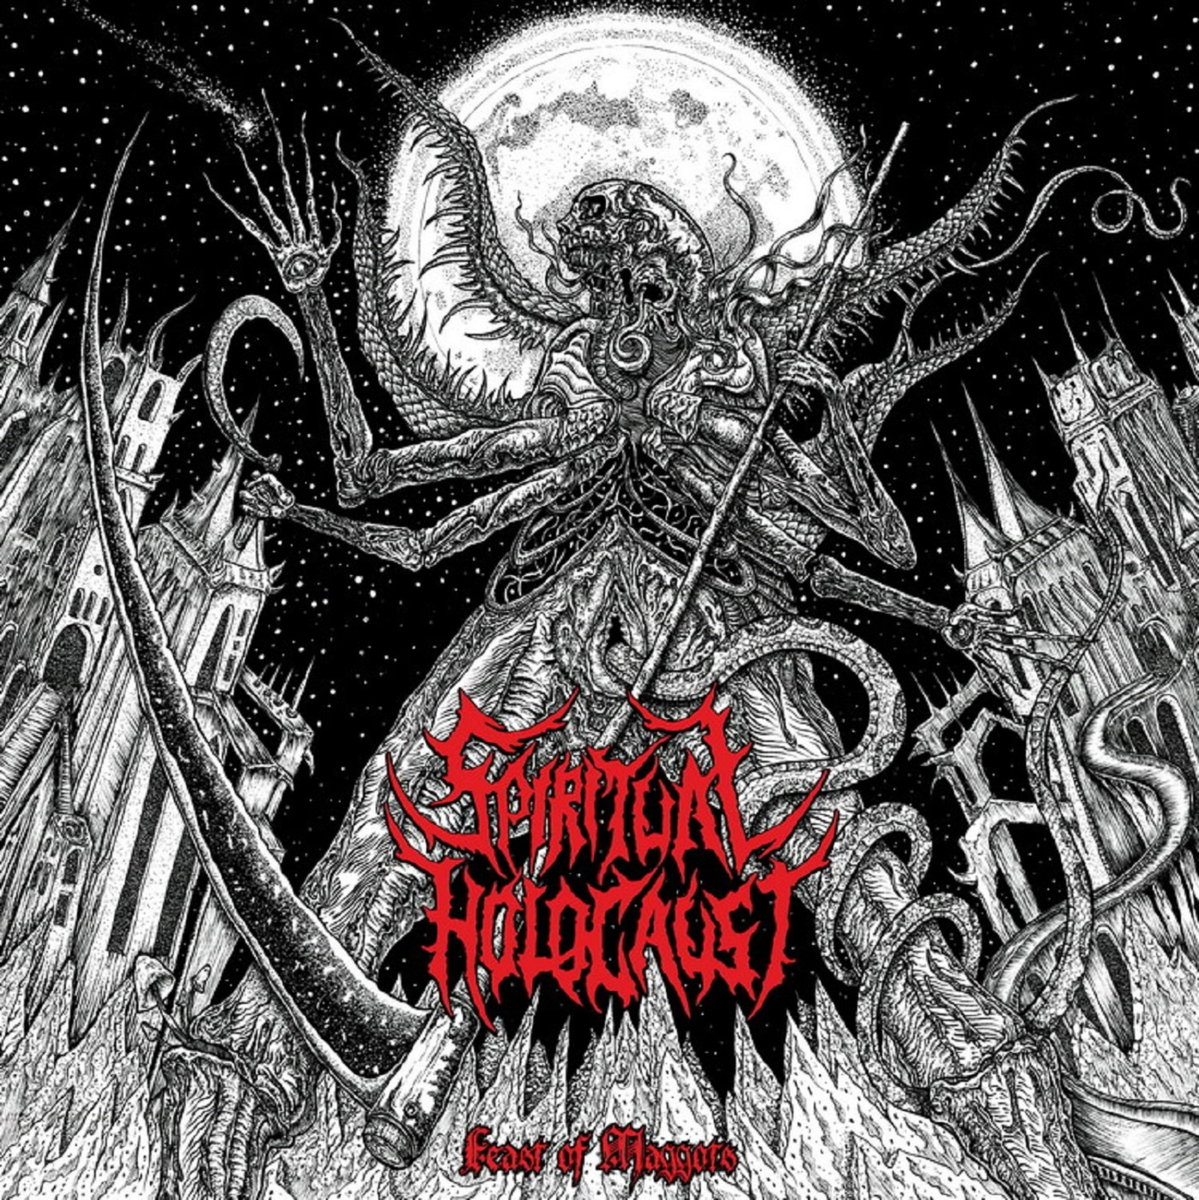 Spiritual Holocaust - Feast Of Maggots (2017)